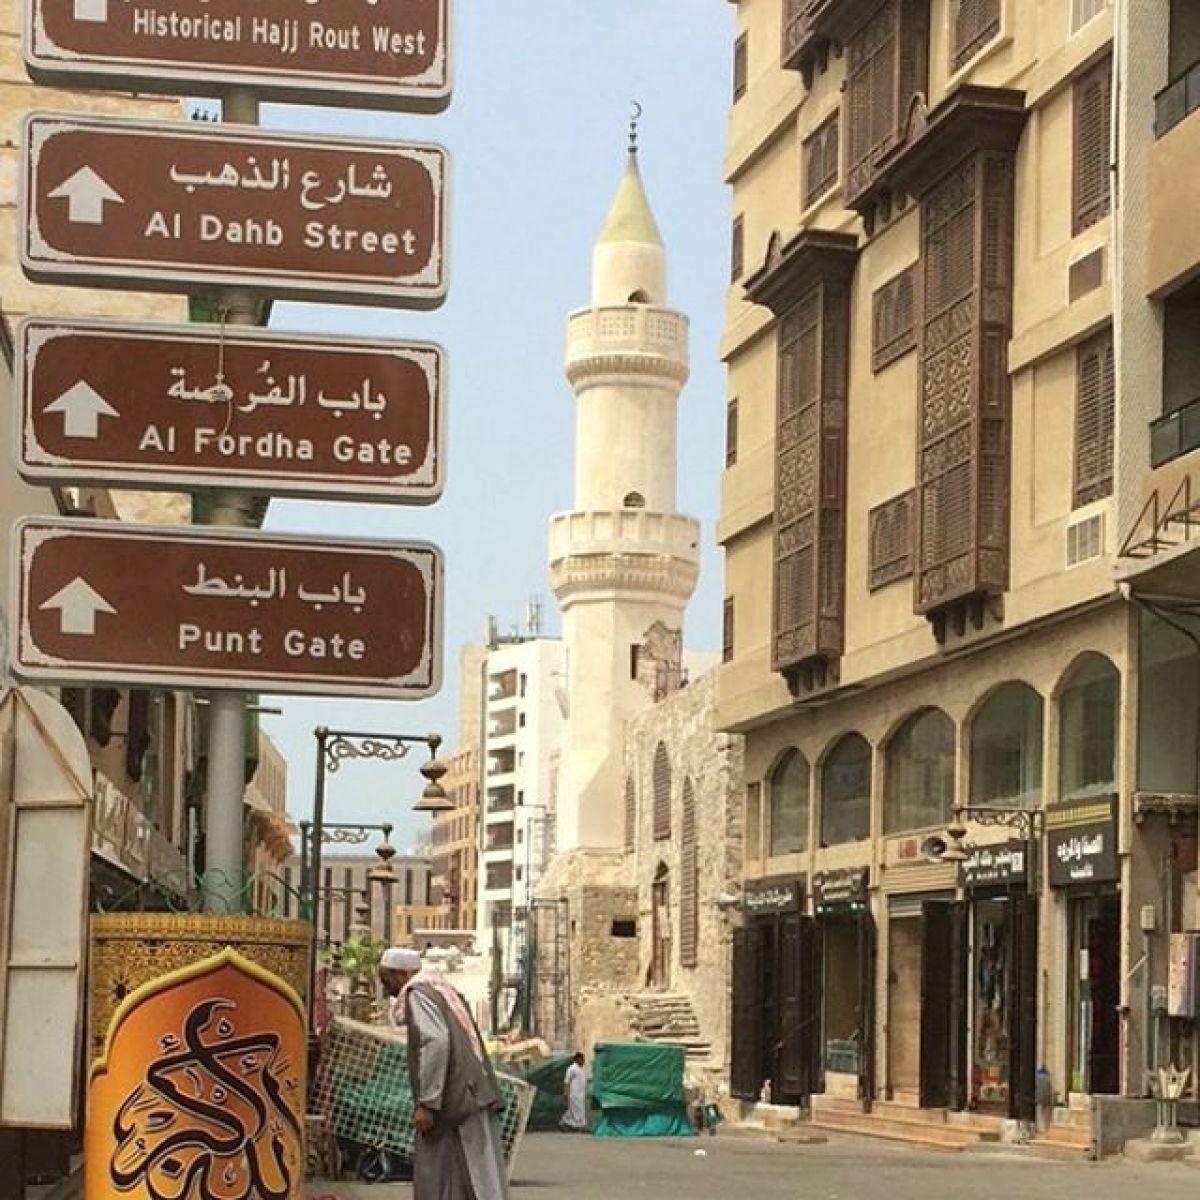 a436a2793 exploring Historic Old Jeddah, Saudi Arabia   Sightseeing Sacketts ...